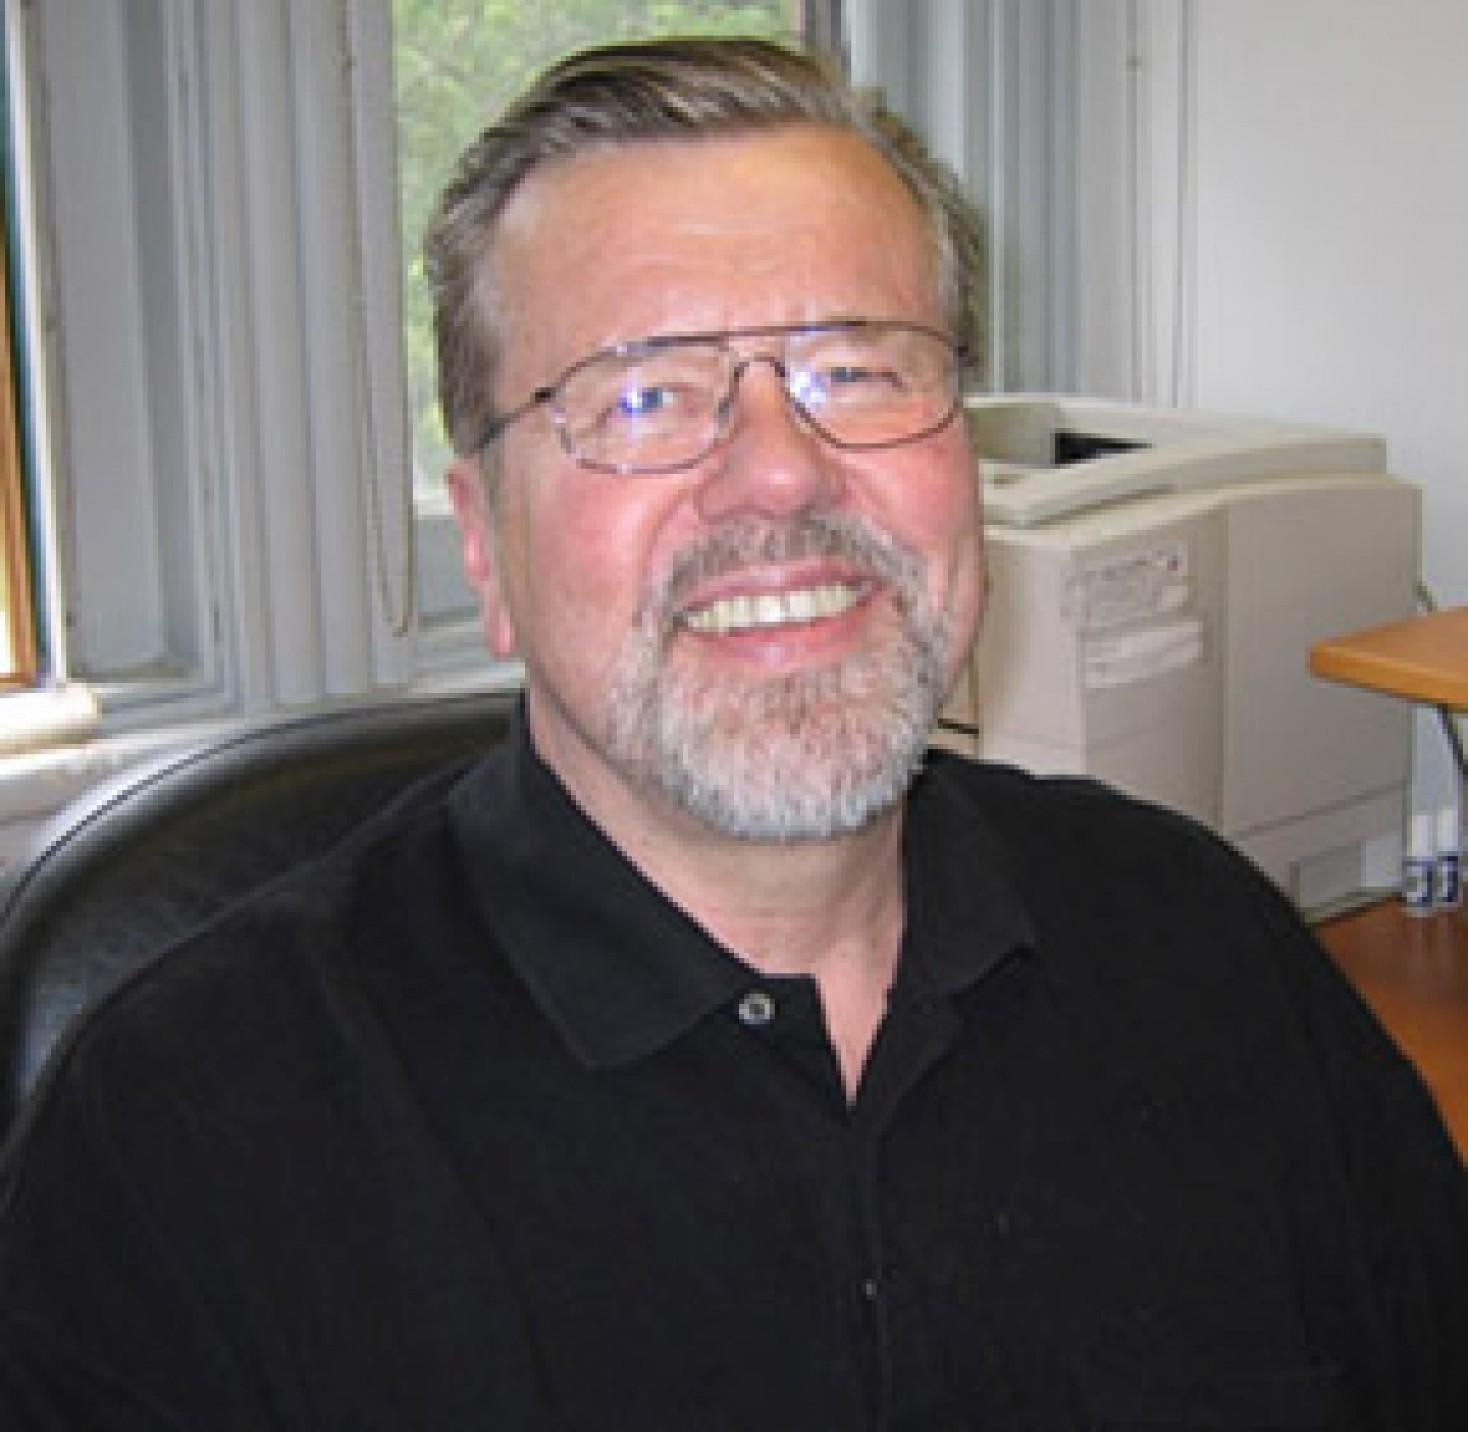 Economist Morley Gunderson says NLs worker's compensation system must be reformed